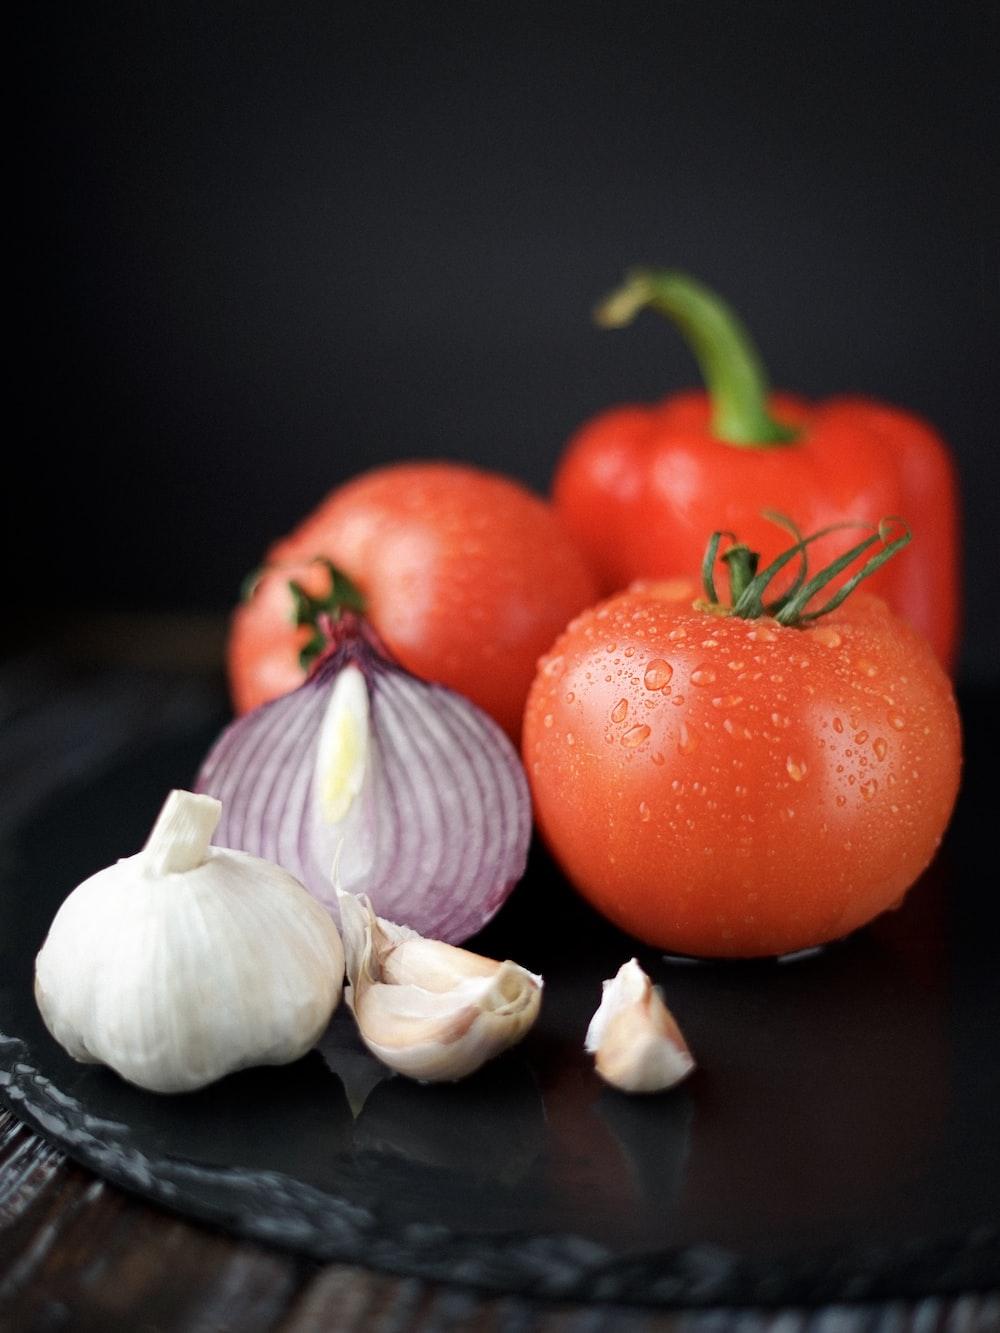 tomatoes, onion, and garlic